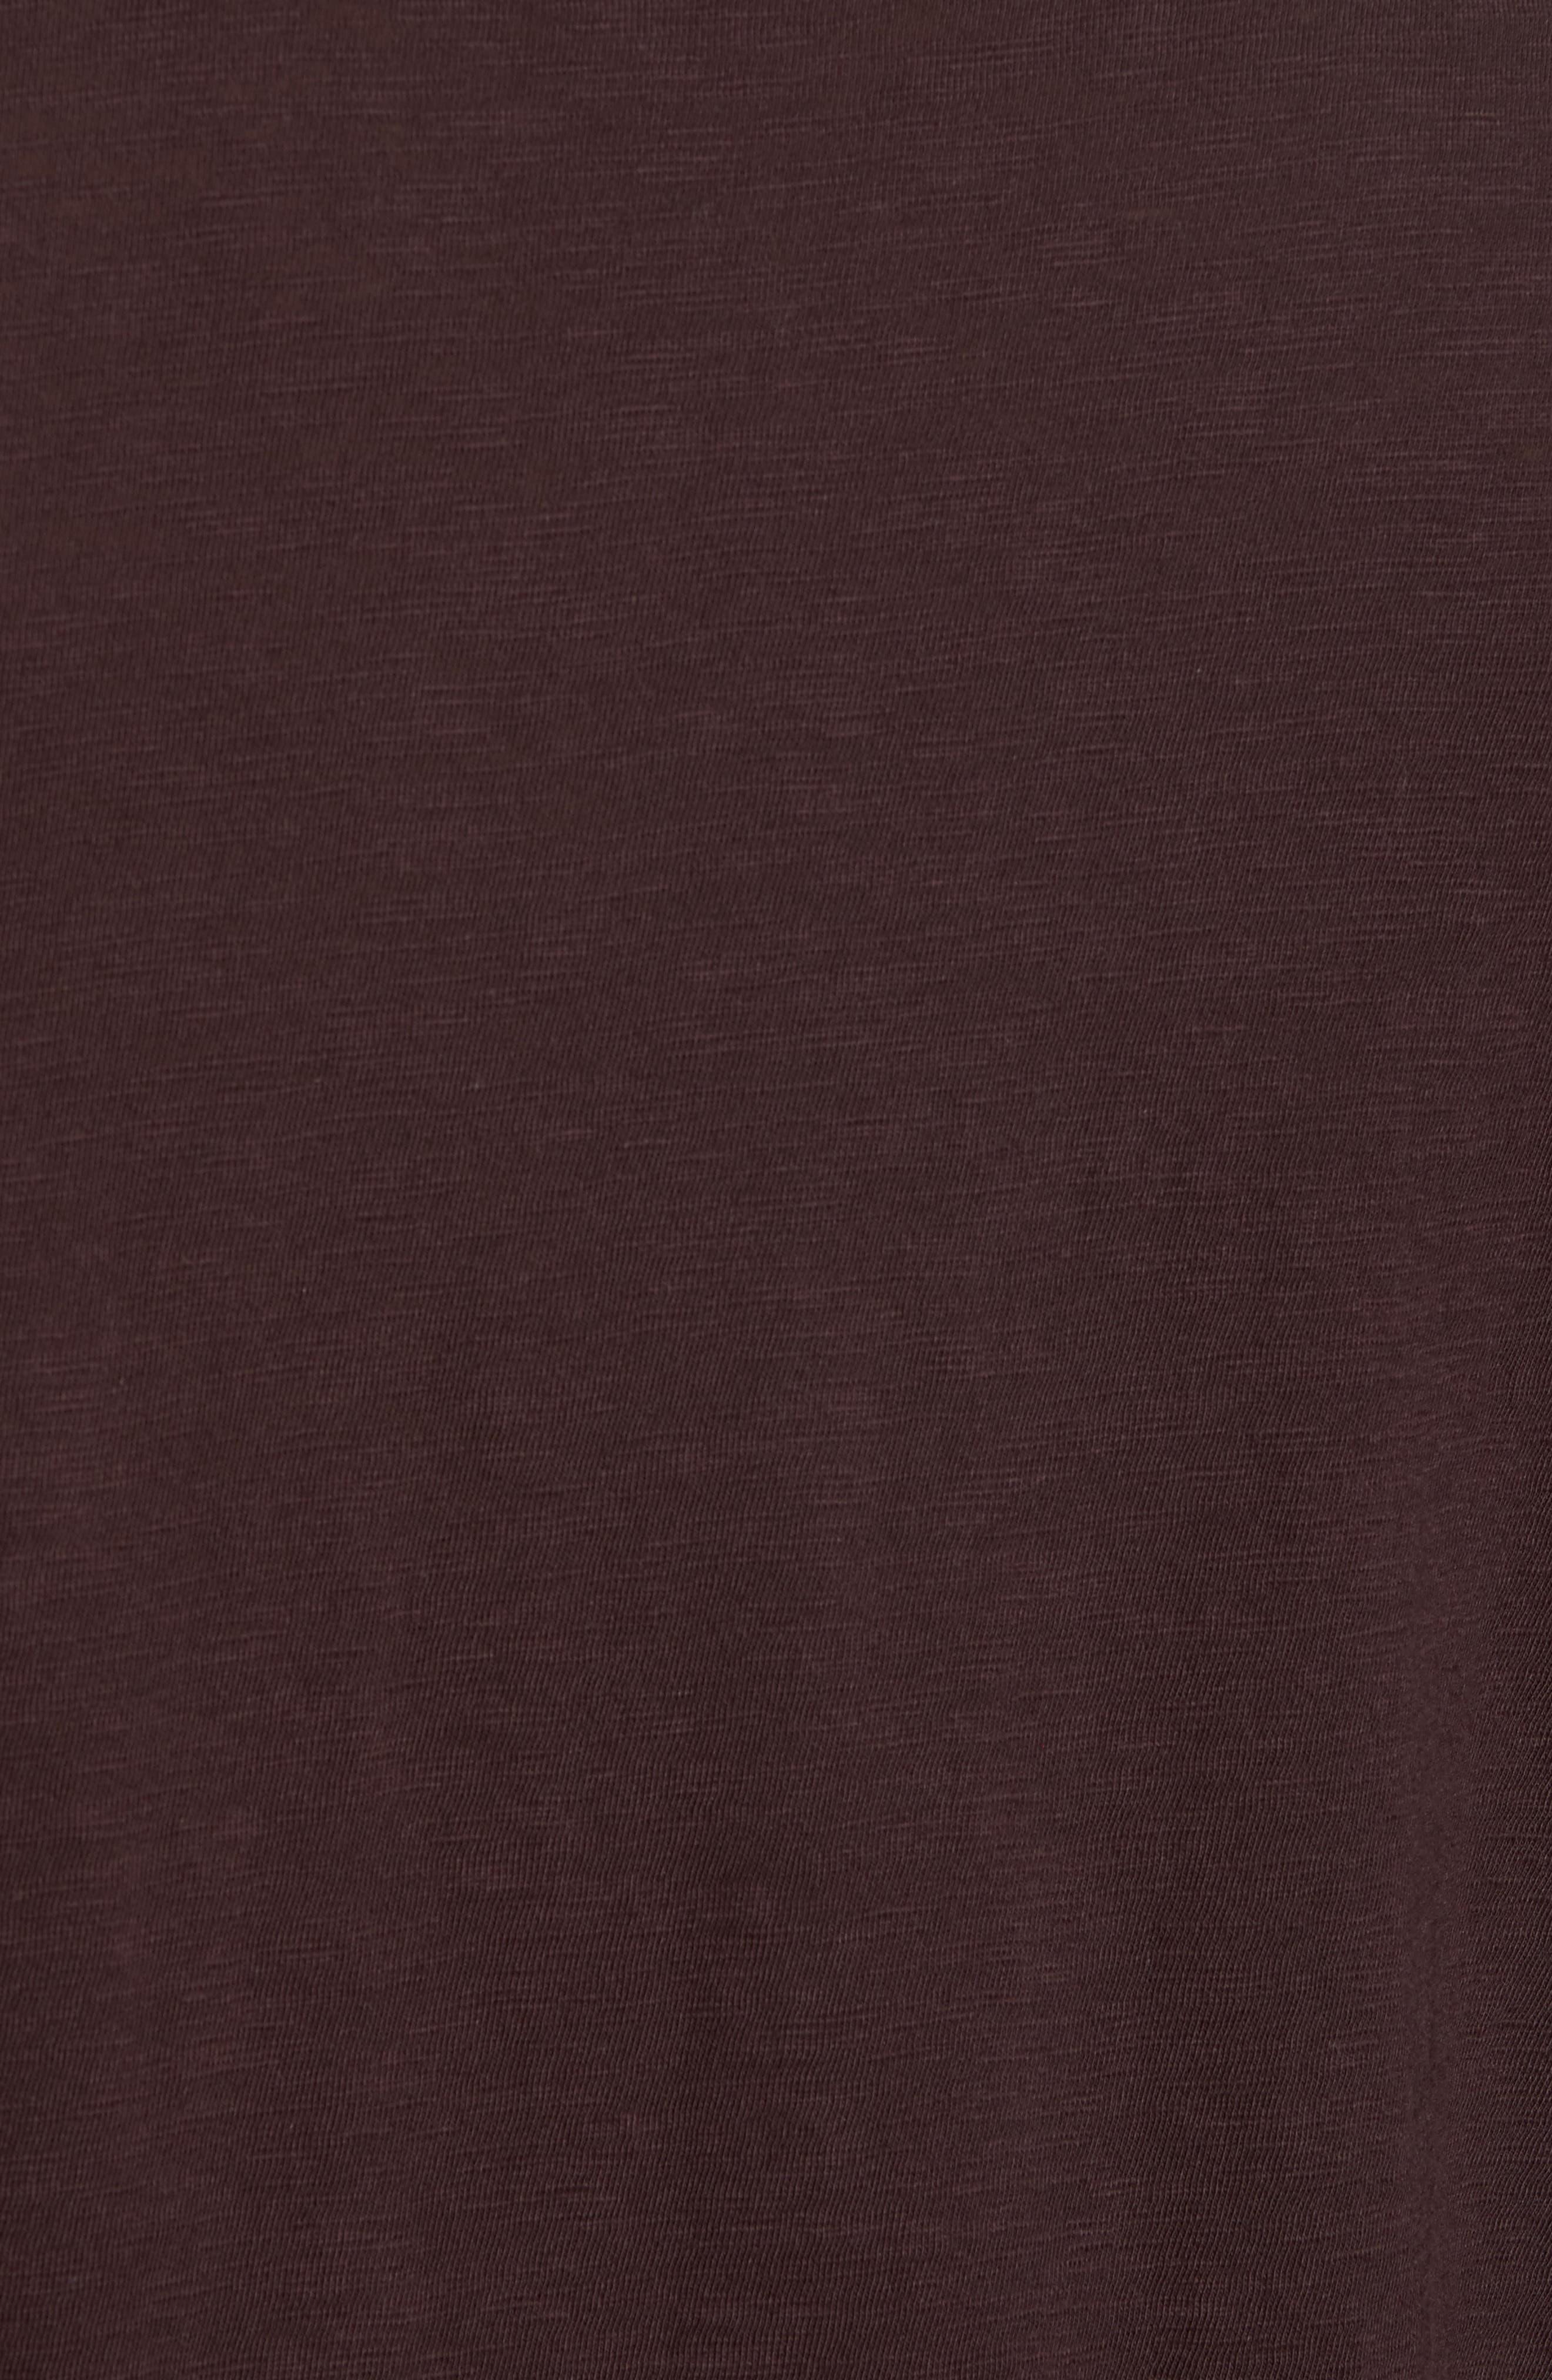 Long Sleeve Slub Henley,                             Alternate thumbnail 5, color,                             Zinfandel